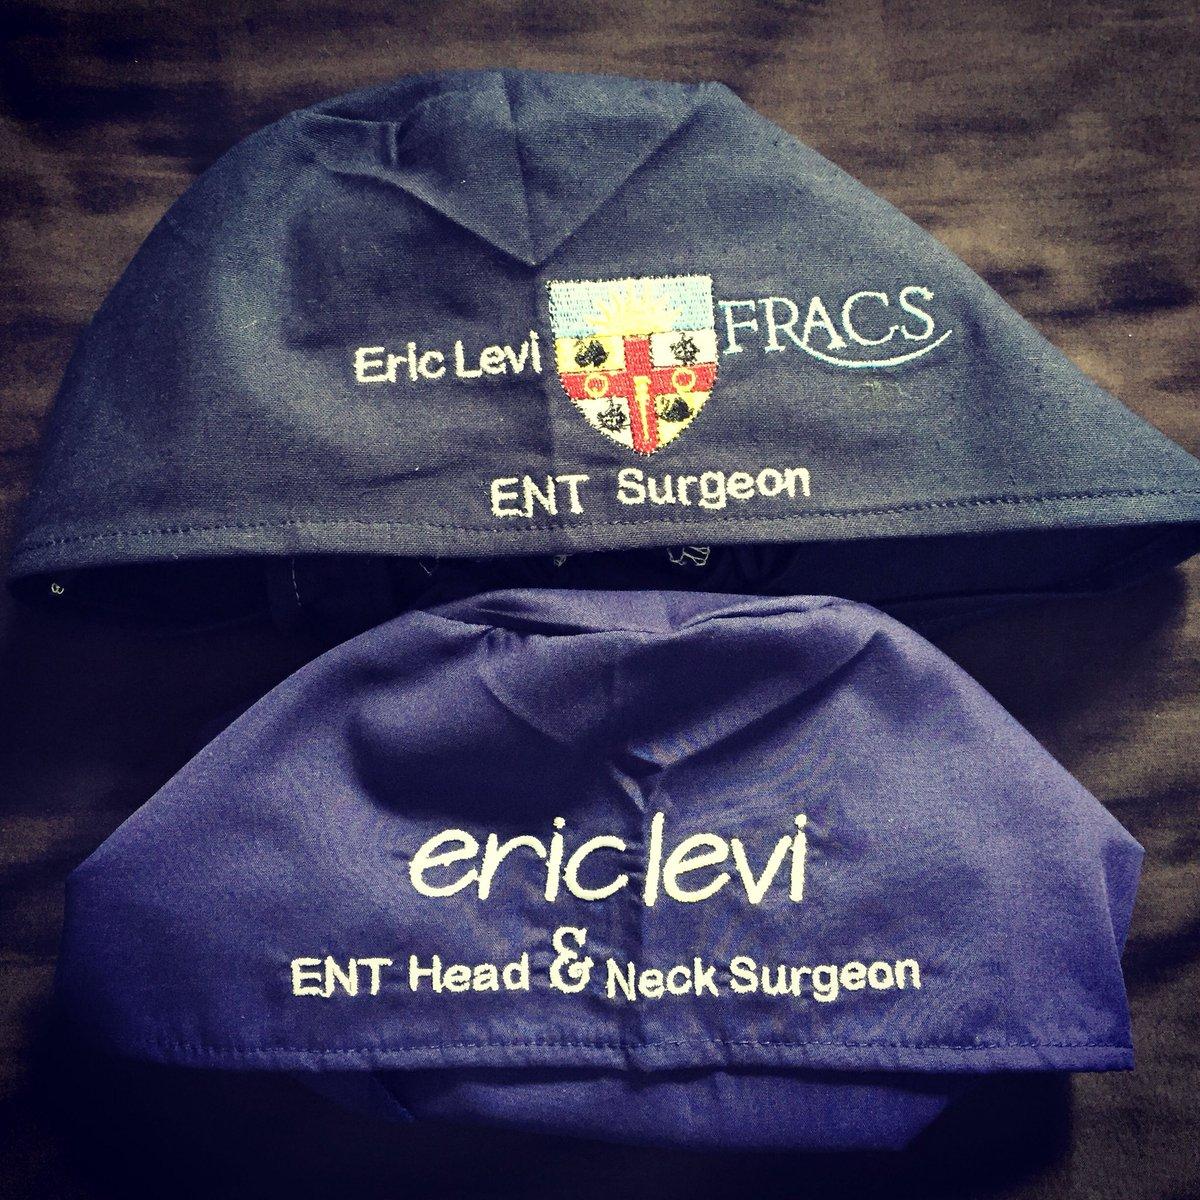 Dr Eric Levi on Twitter: